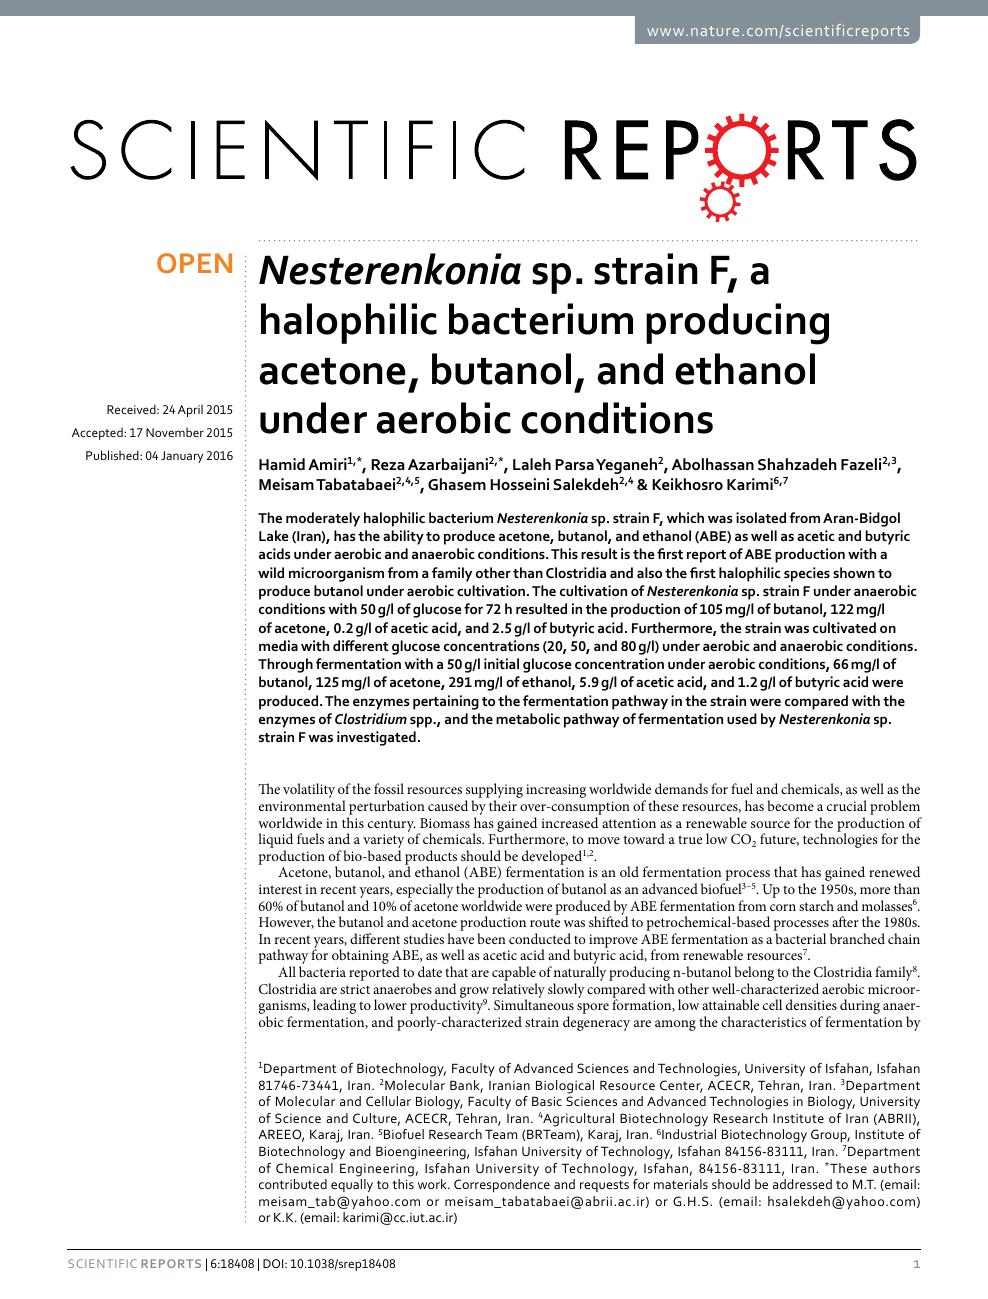 Nesterenkonia sp  strain F, a halophilic bacterium producing acetone